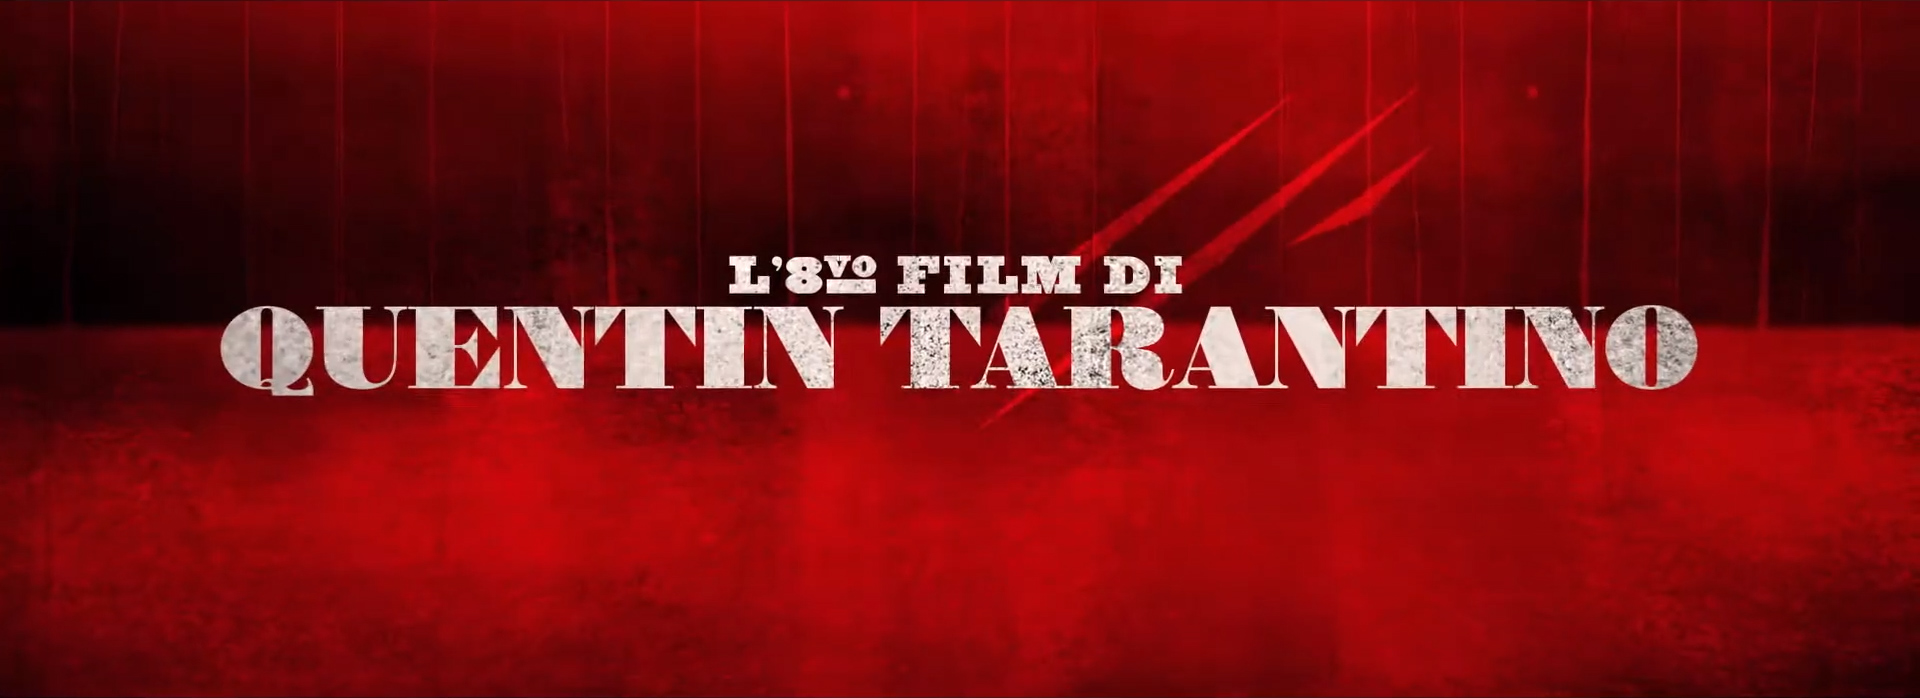 titling-tara-1